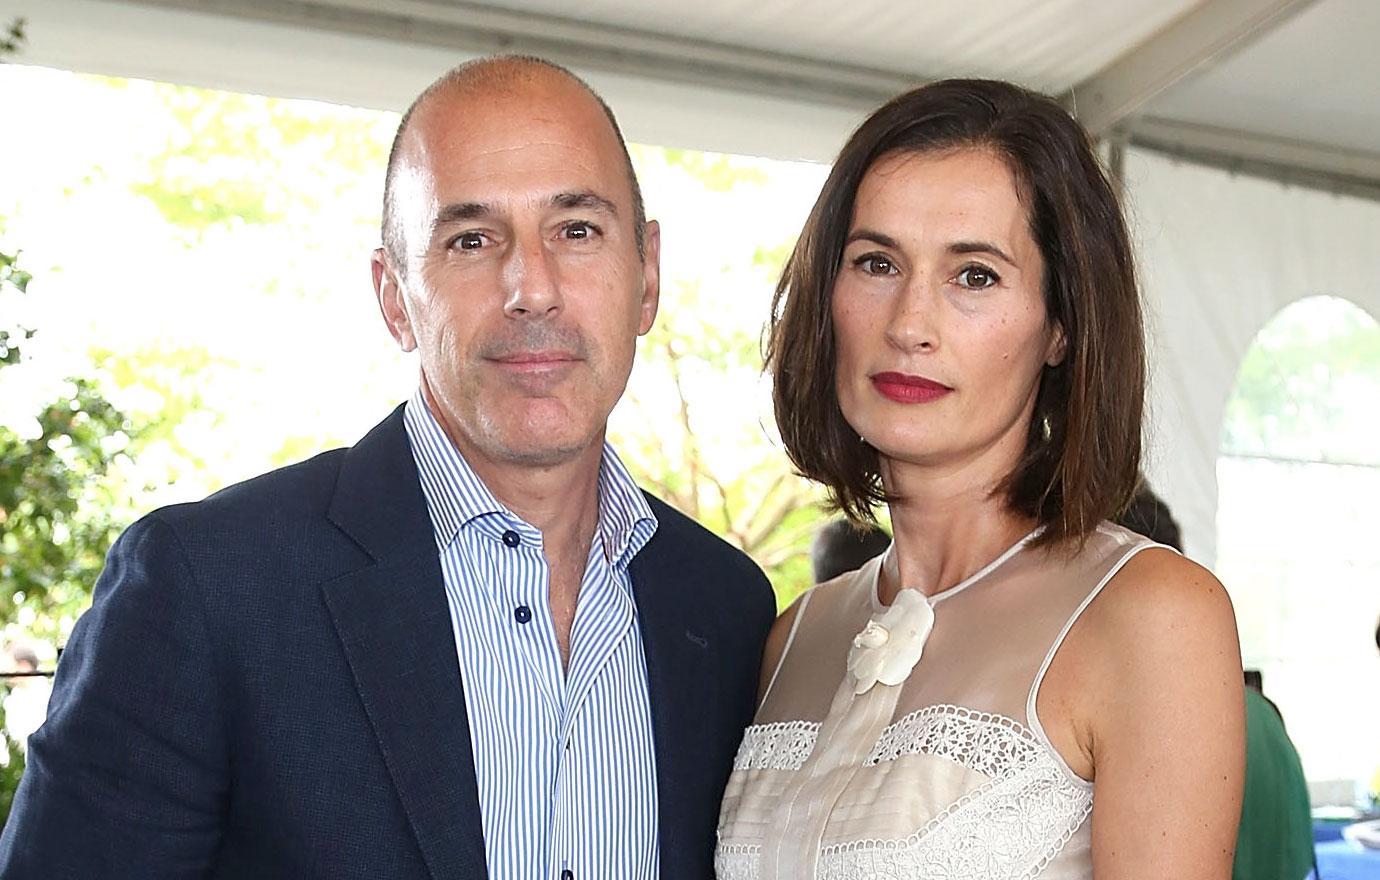 Matt Lauer's Wife Annette Roque Heads Home To Holland